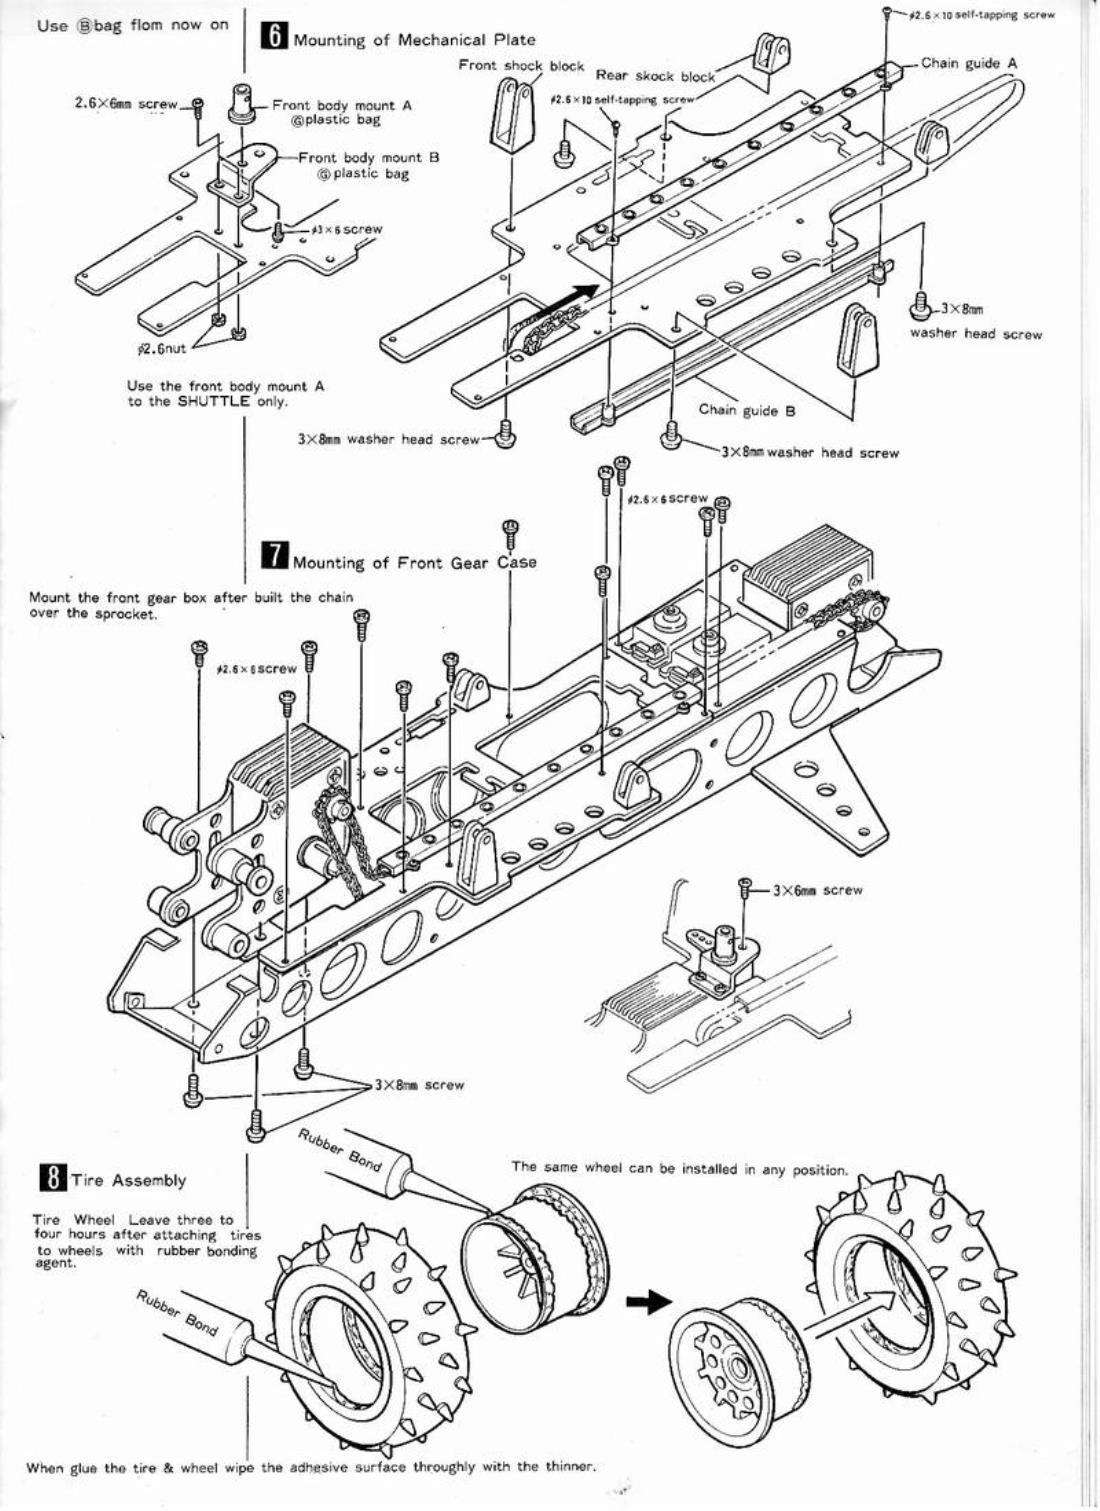 99986: AYK from Spike showroom, AYK Viper assembly manual